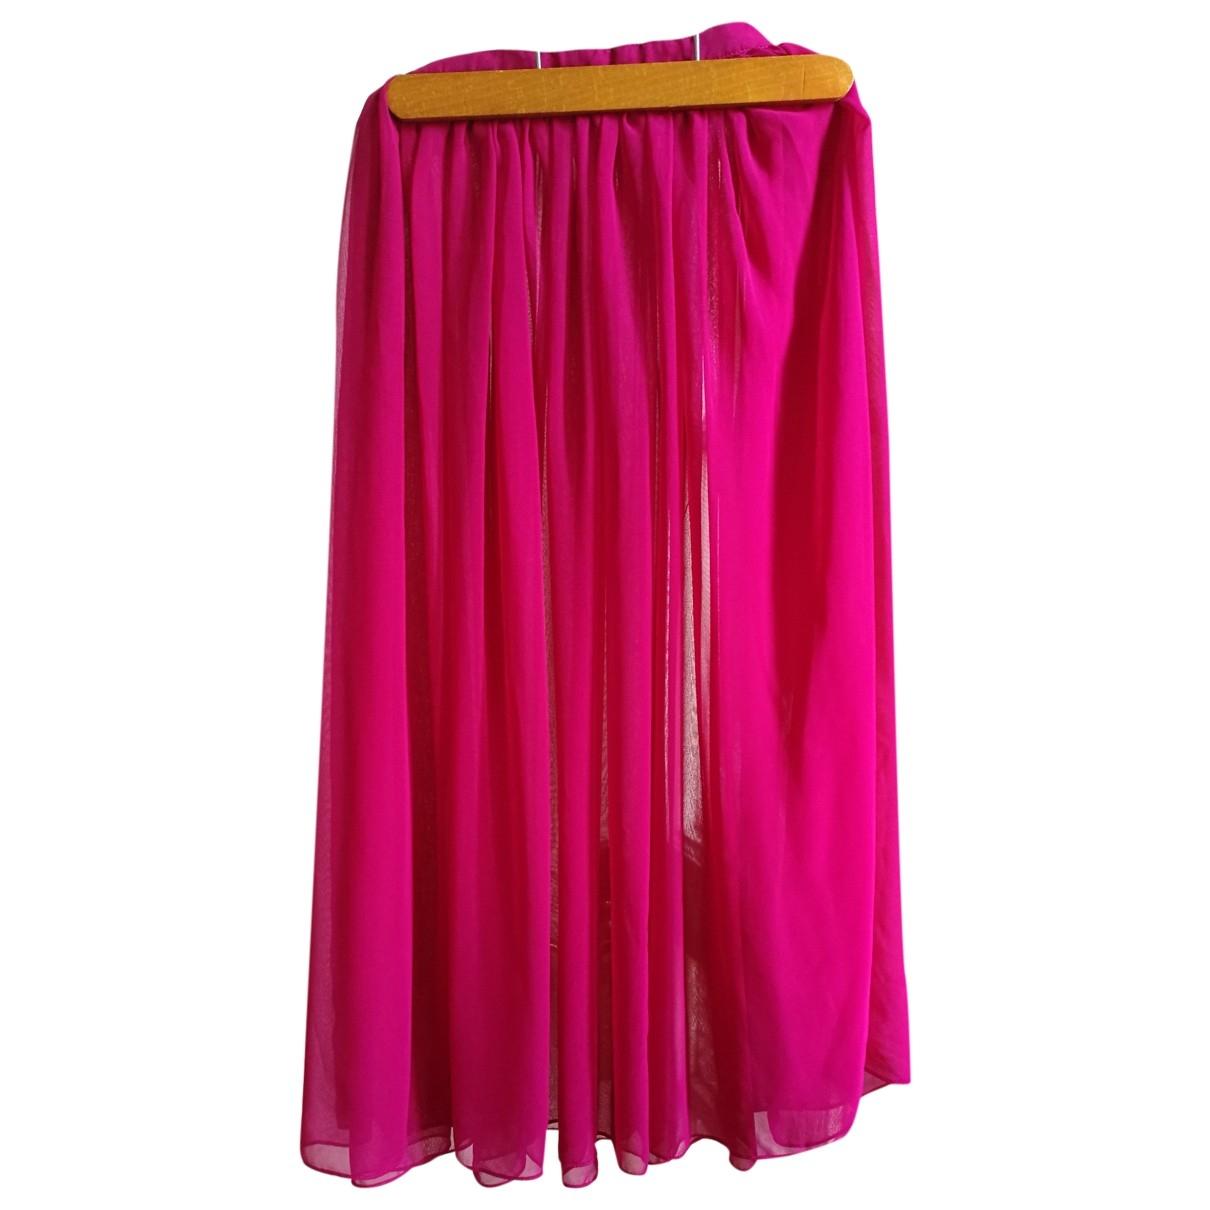 Sonia Rykiel - Jupe   pour femme en soie - rose